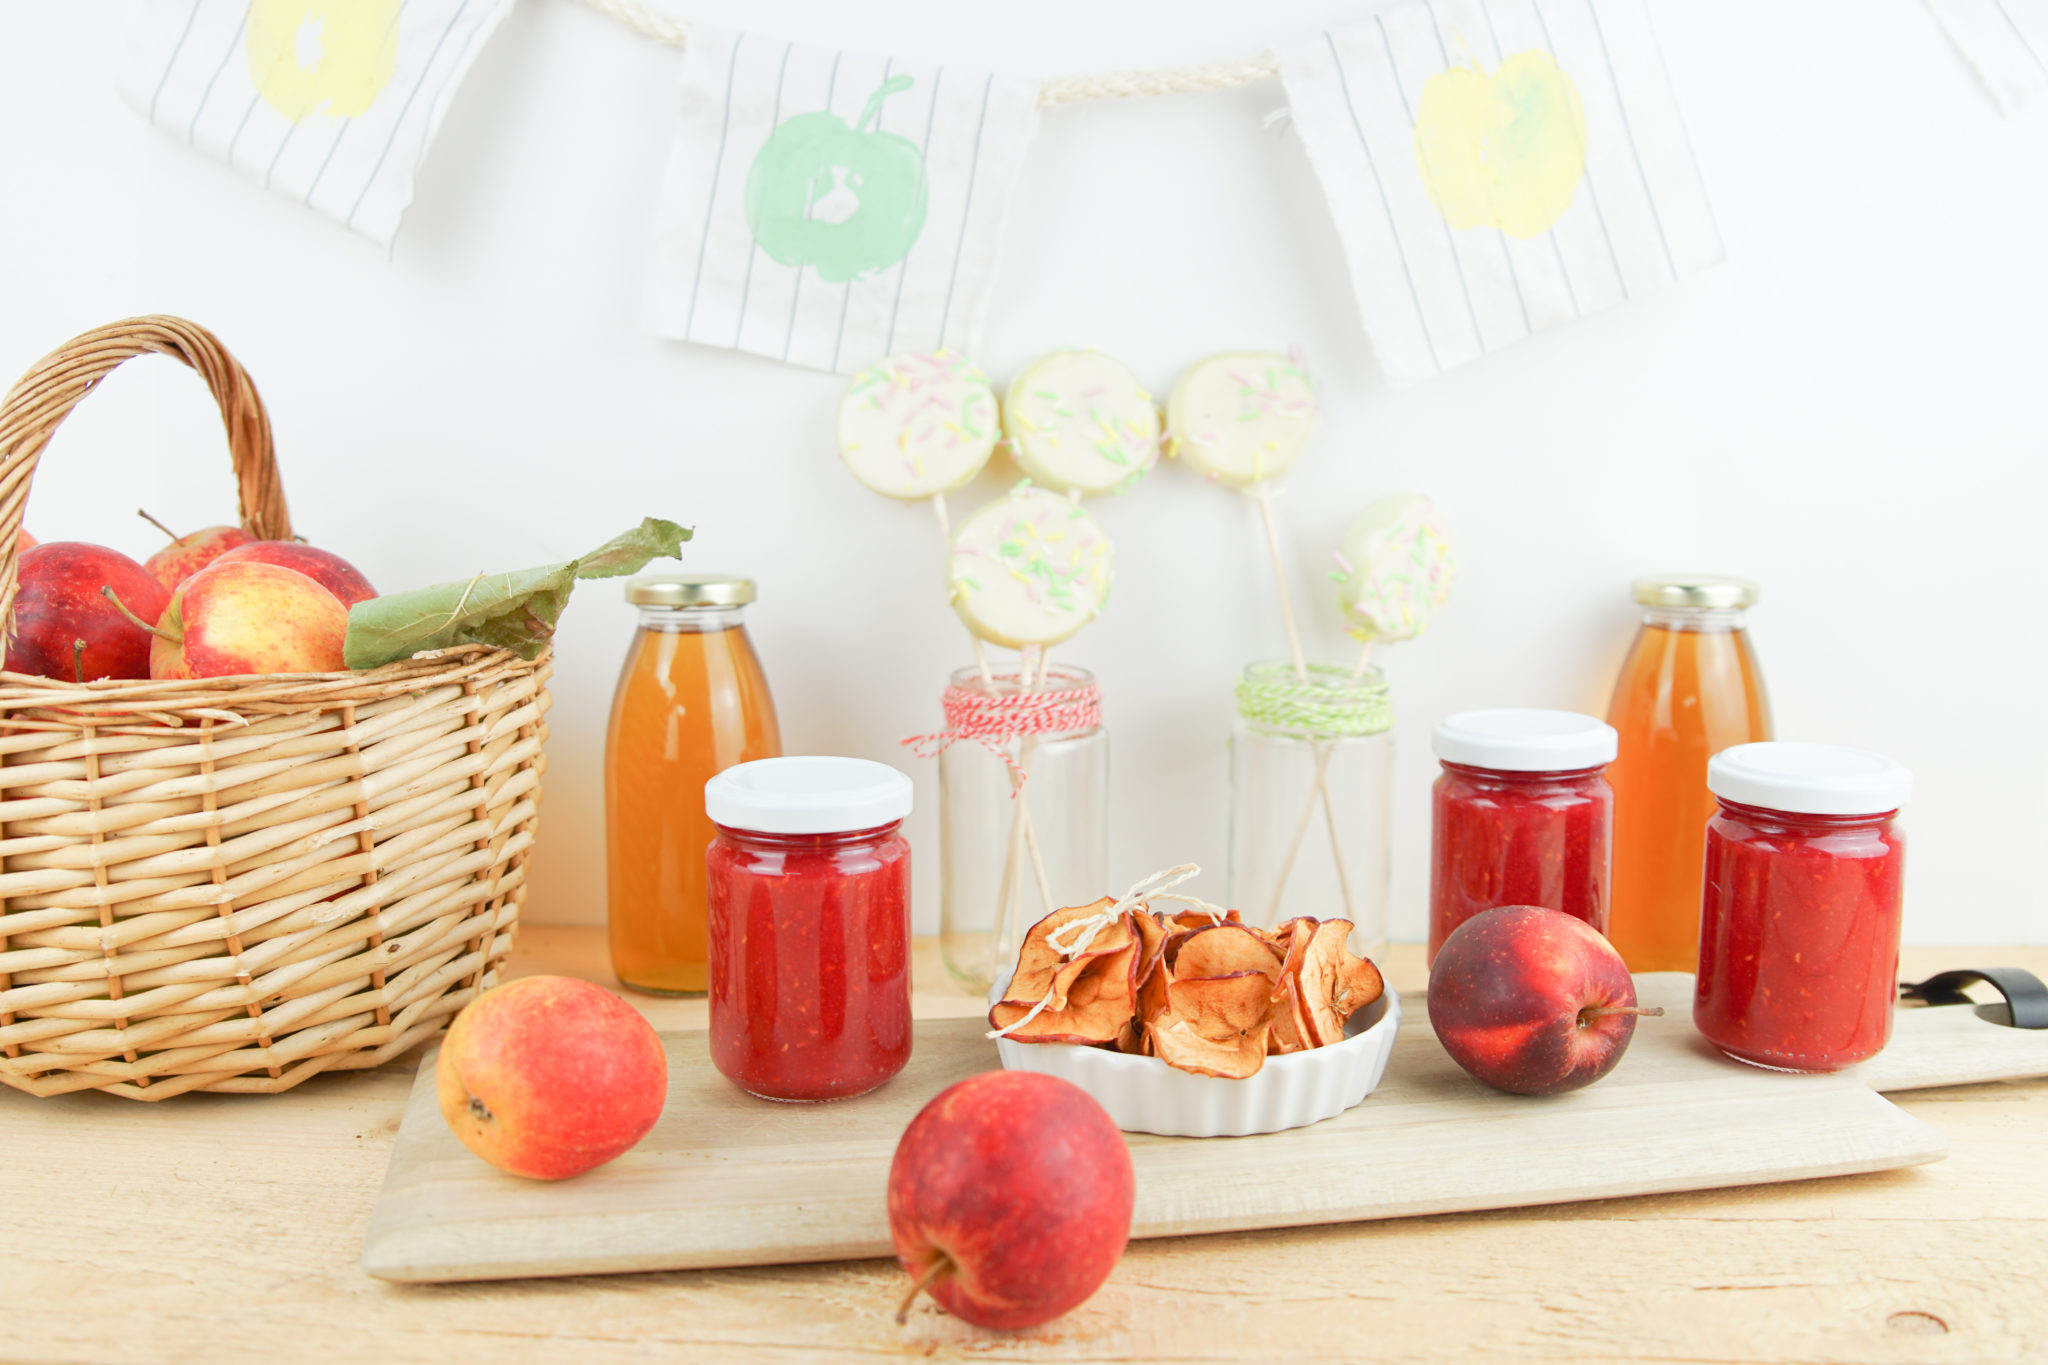 Es ist so weit Apfelzeit: Apfelchips, Apfelsirup, Apfeldruck, Apfelmarmelade, Apfelstiel